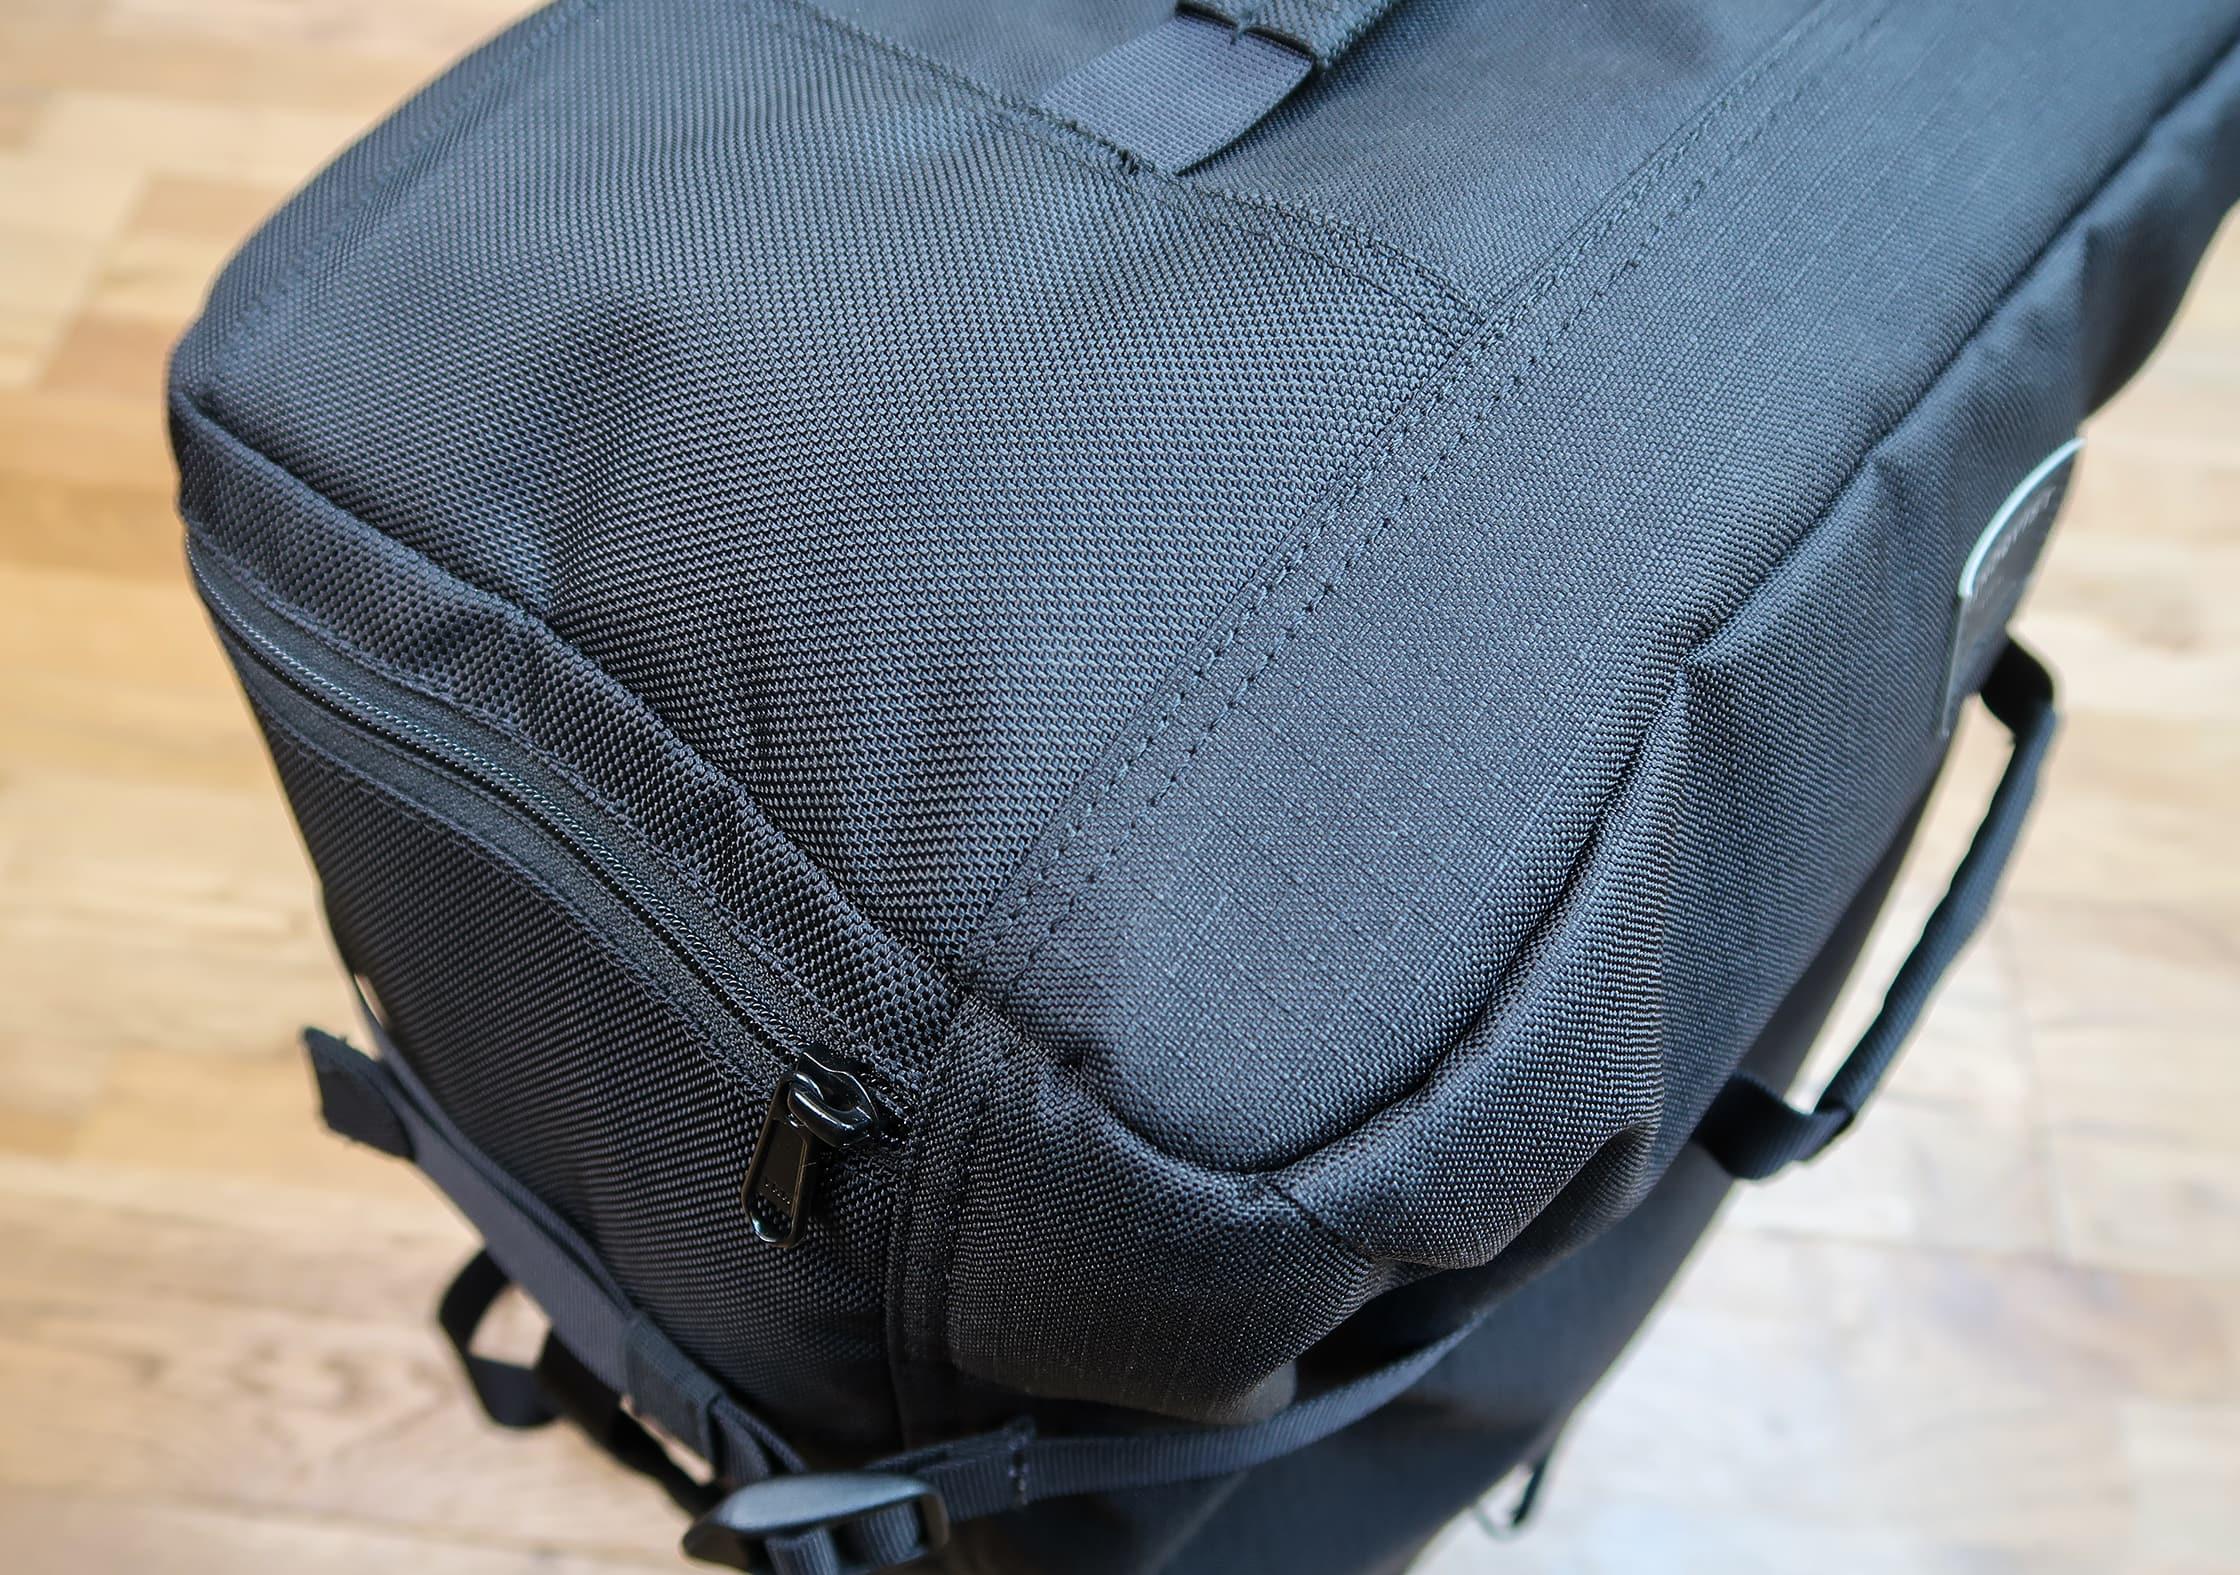 Ballistic Nylon and 1680D Cordura Fabric